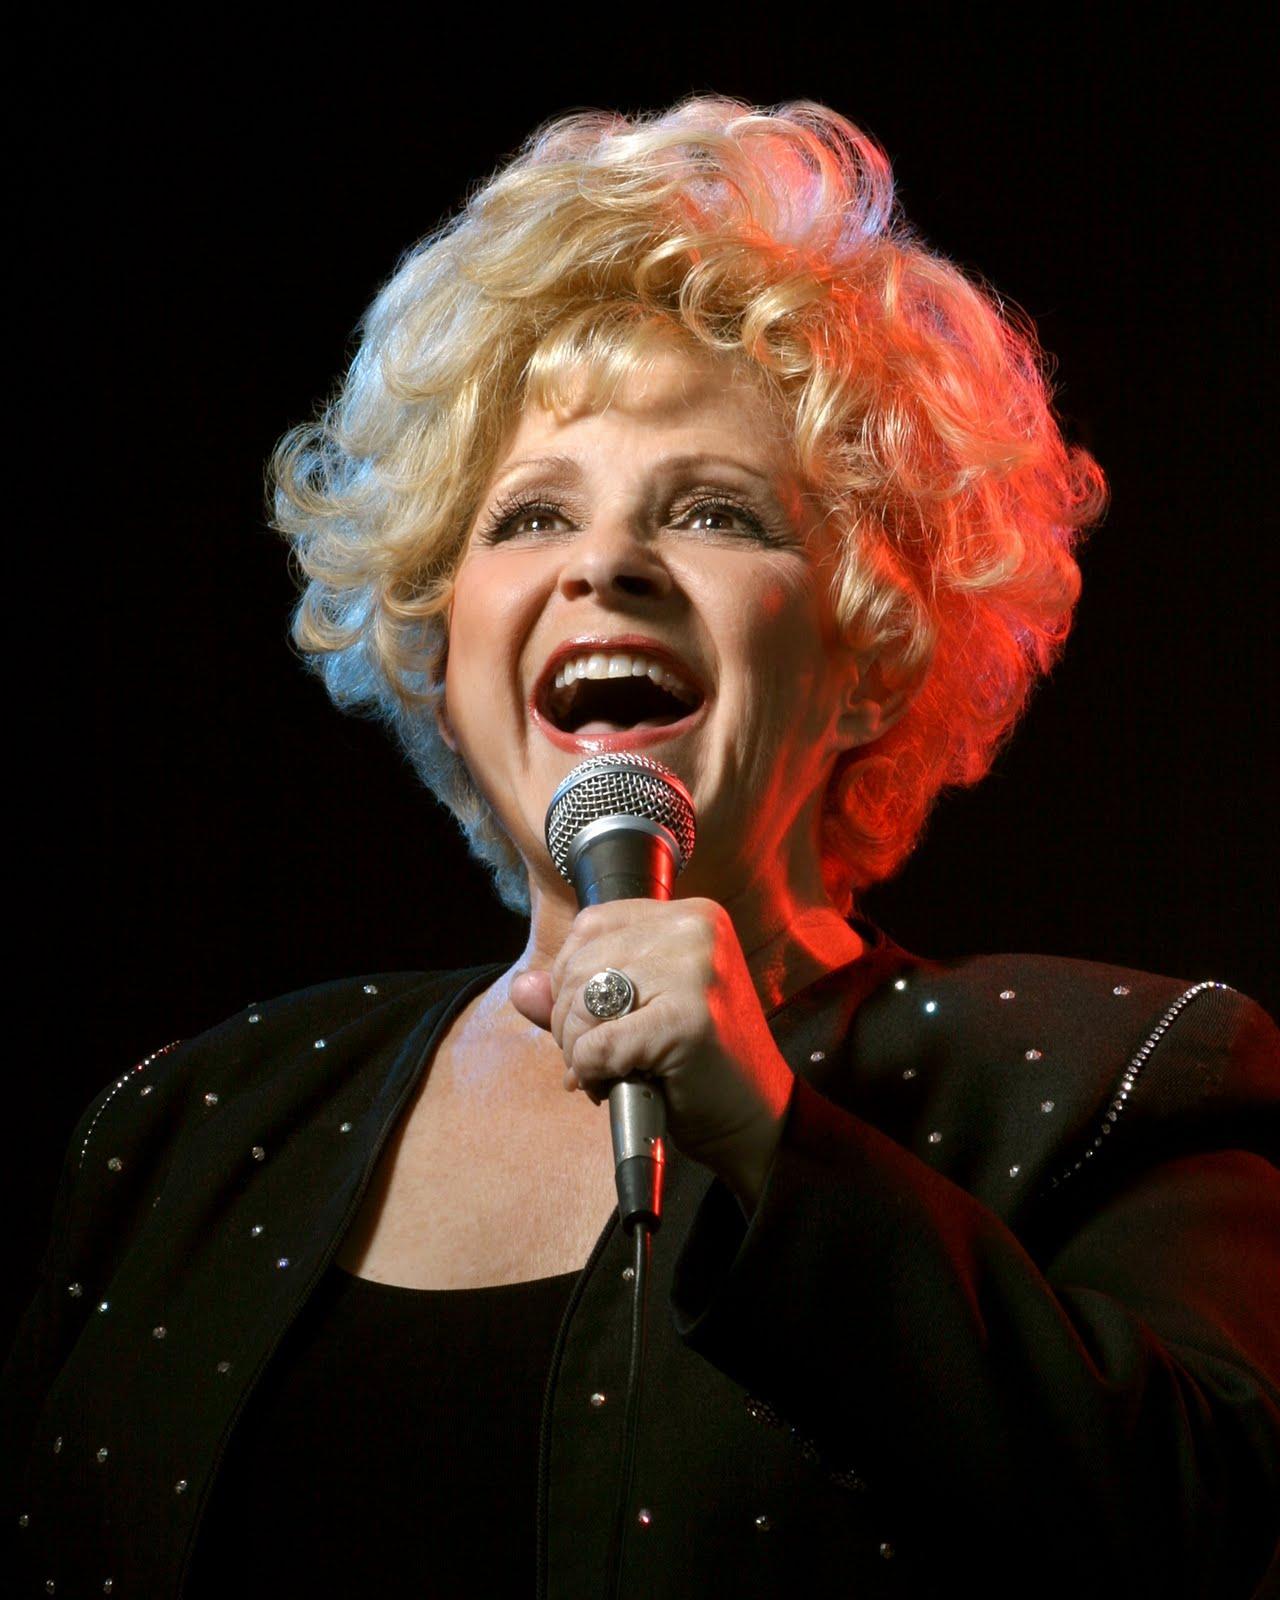 http://2.bp.blogspot.com/--jv6qE9U7sc/TrTxmxVkHwI/AAAAAAAABCY/yJIrO-2QF5g/s1600/brenda-singing.jpg